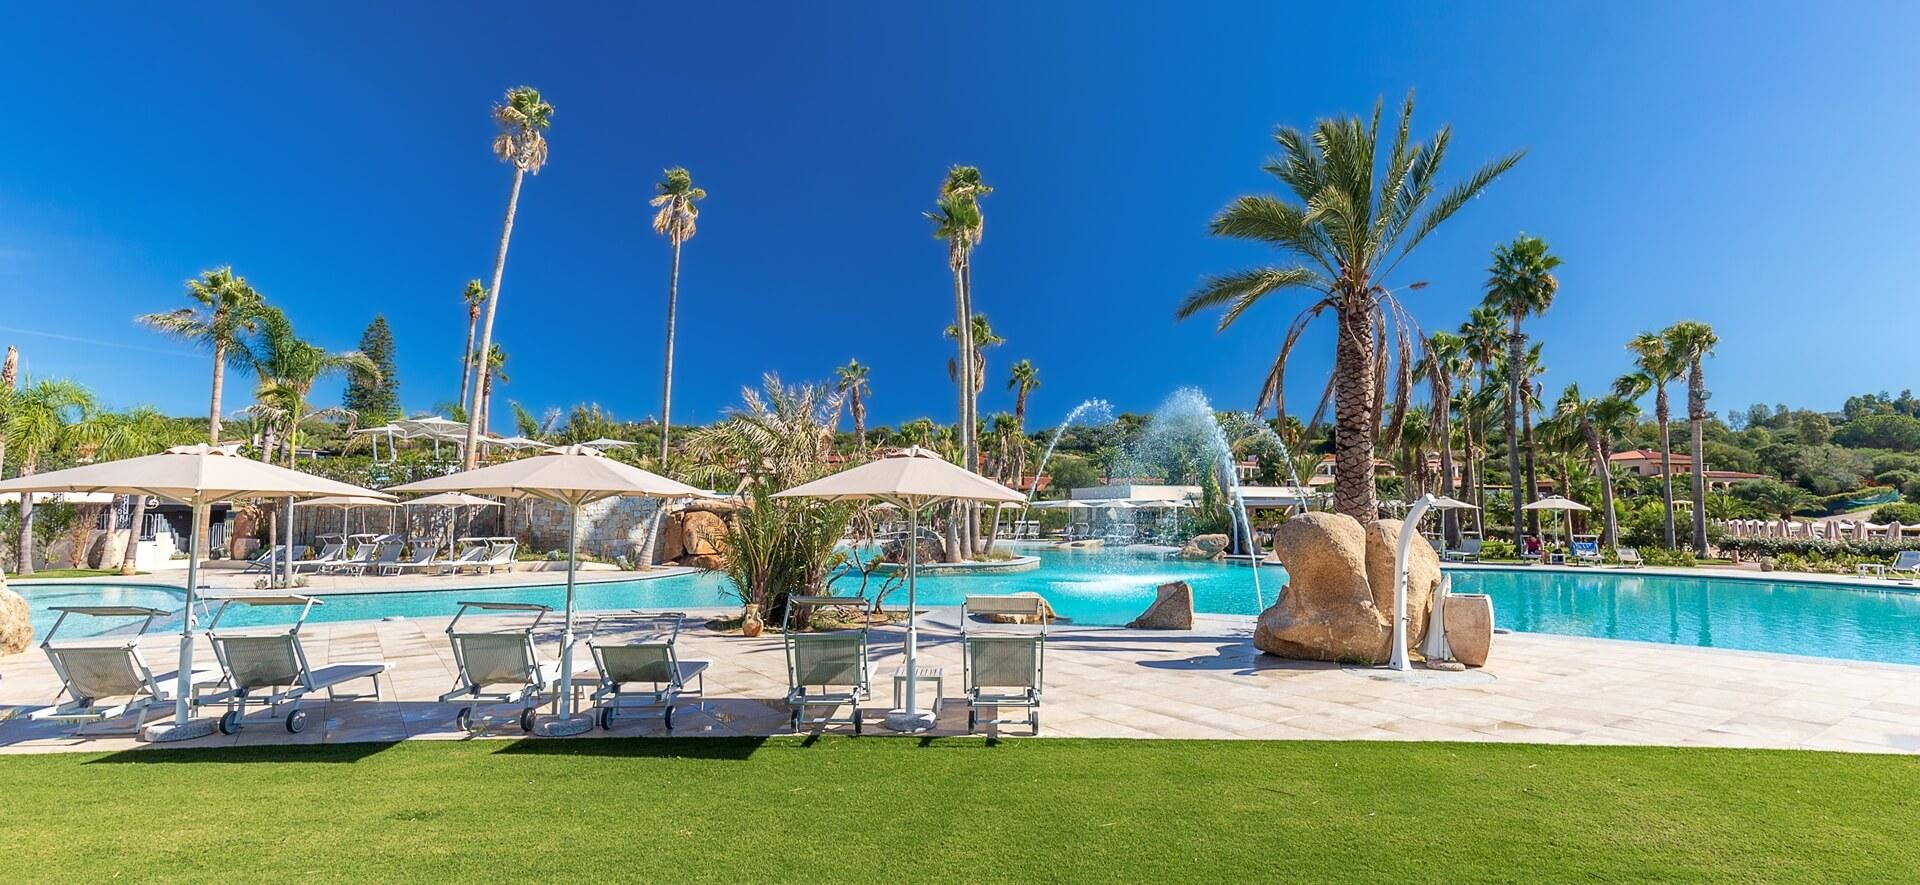 hotel-piscina-tropicale-sardegna-03